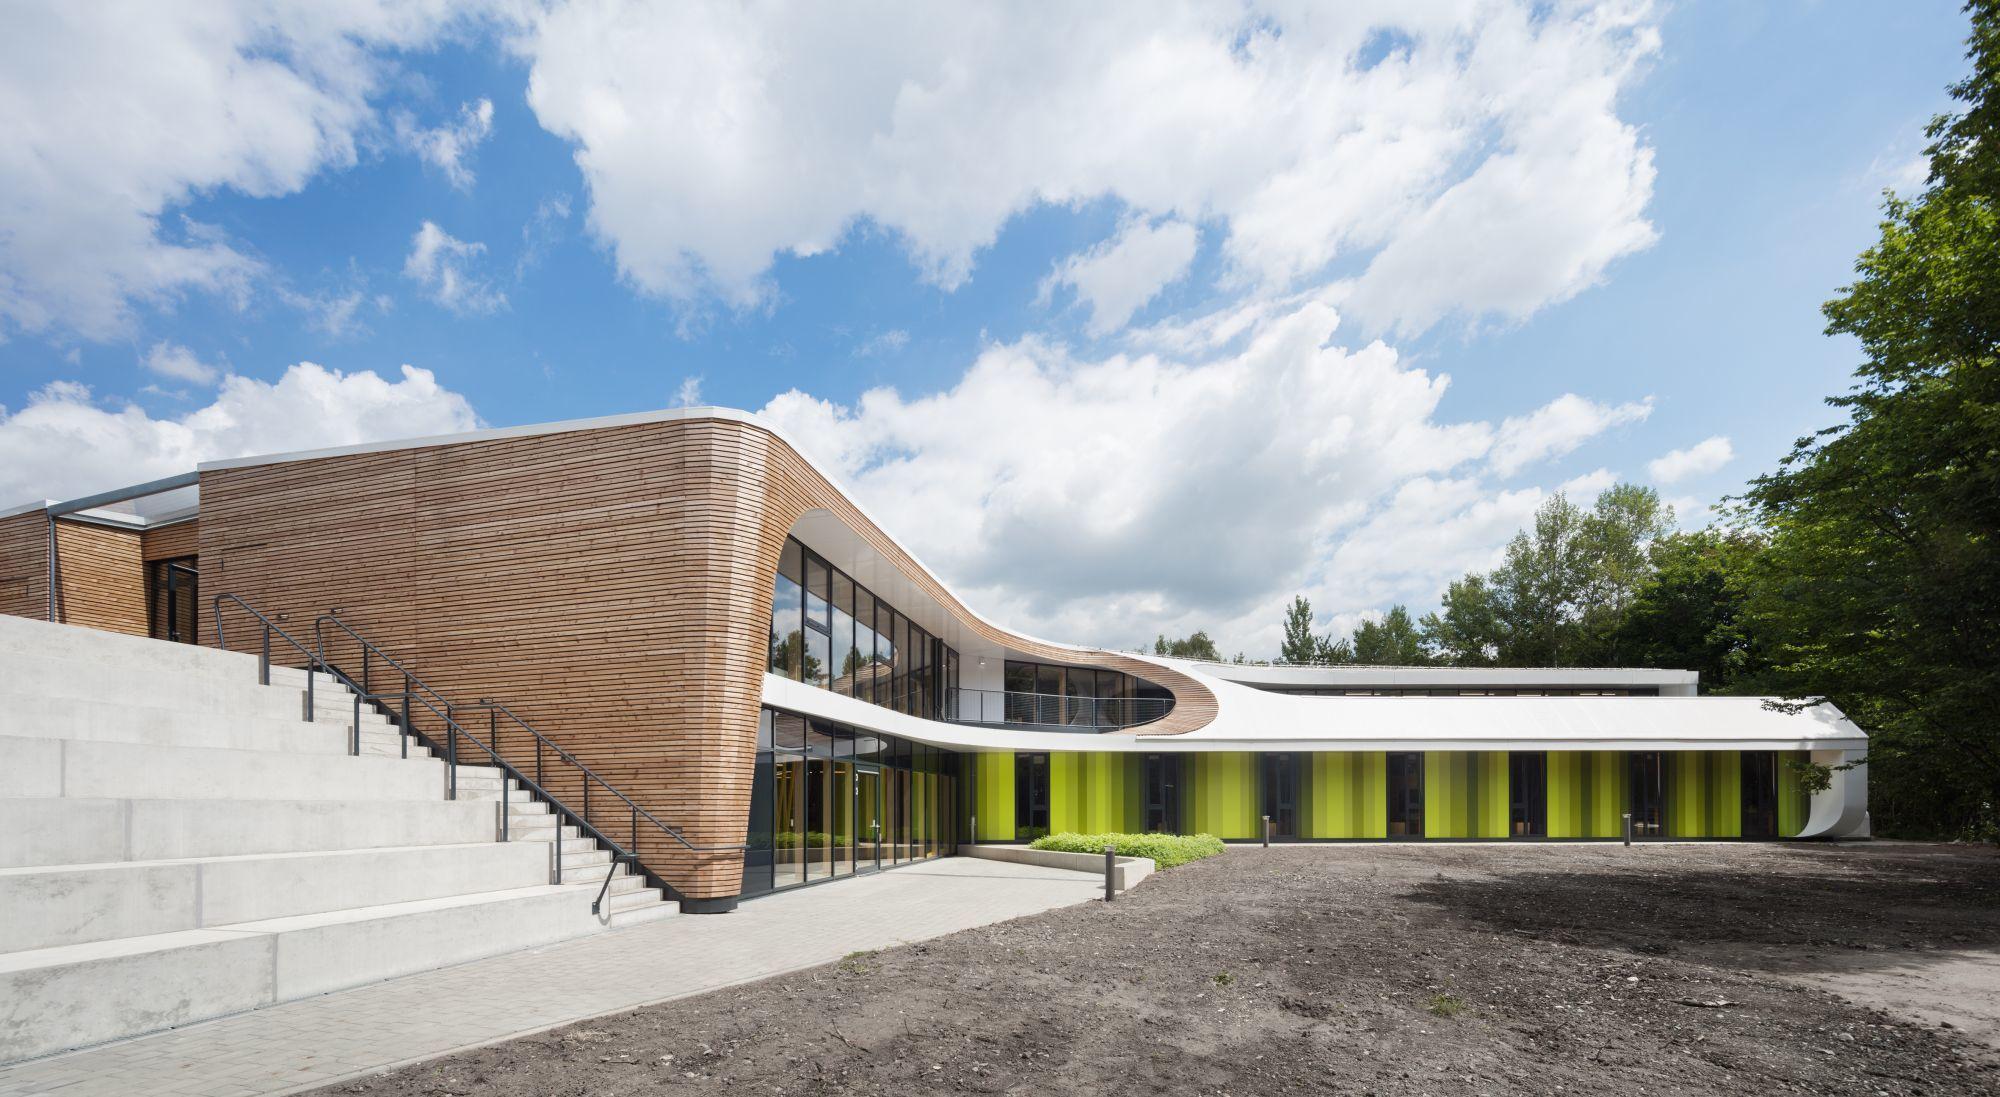 Architekten Bayreuth jugendherberge bayreuth lava laboratory for visionary architecture